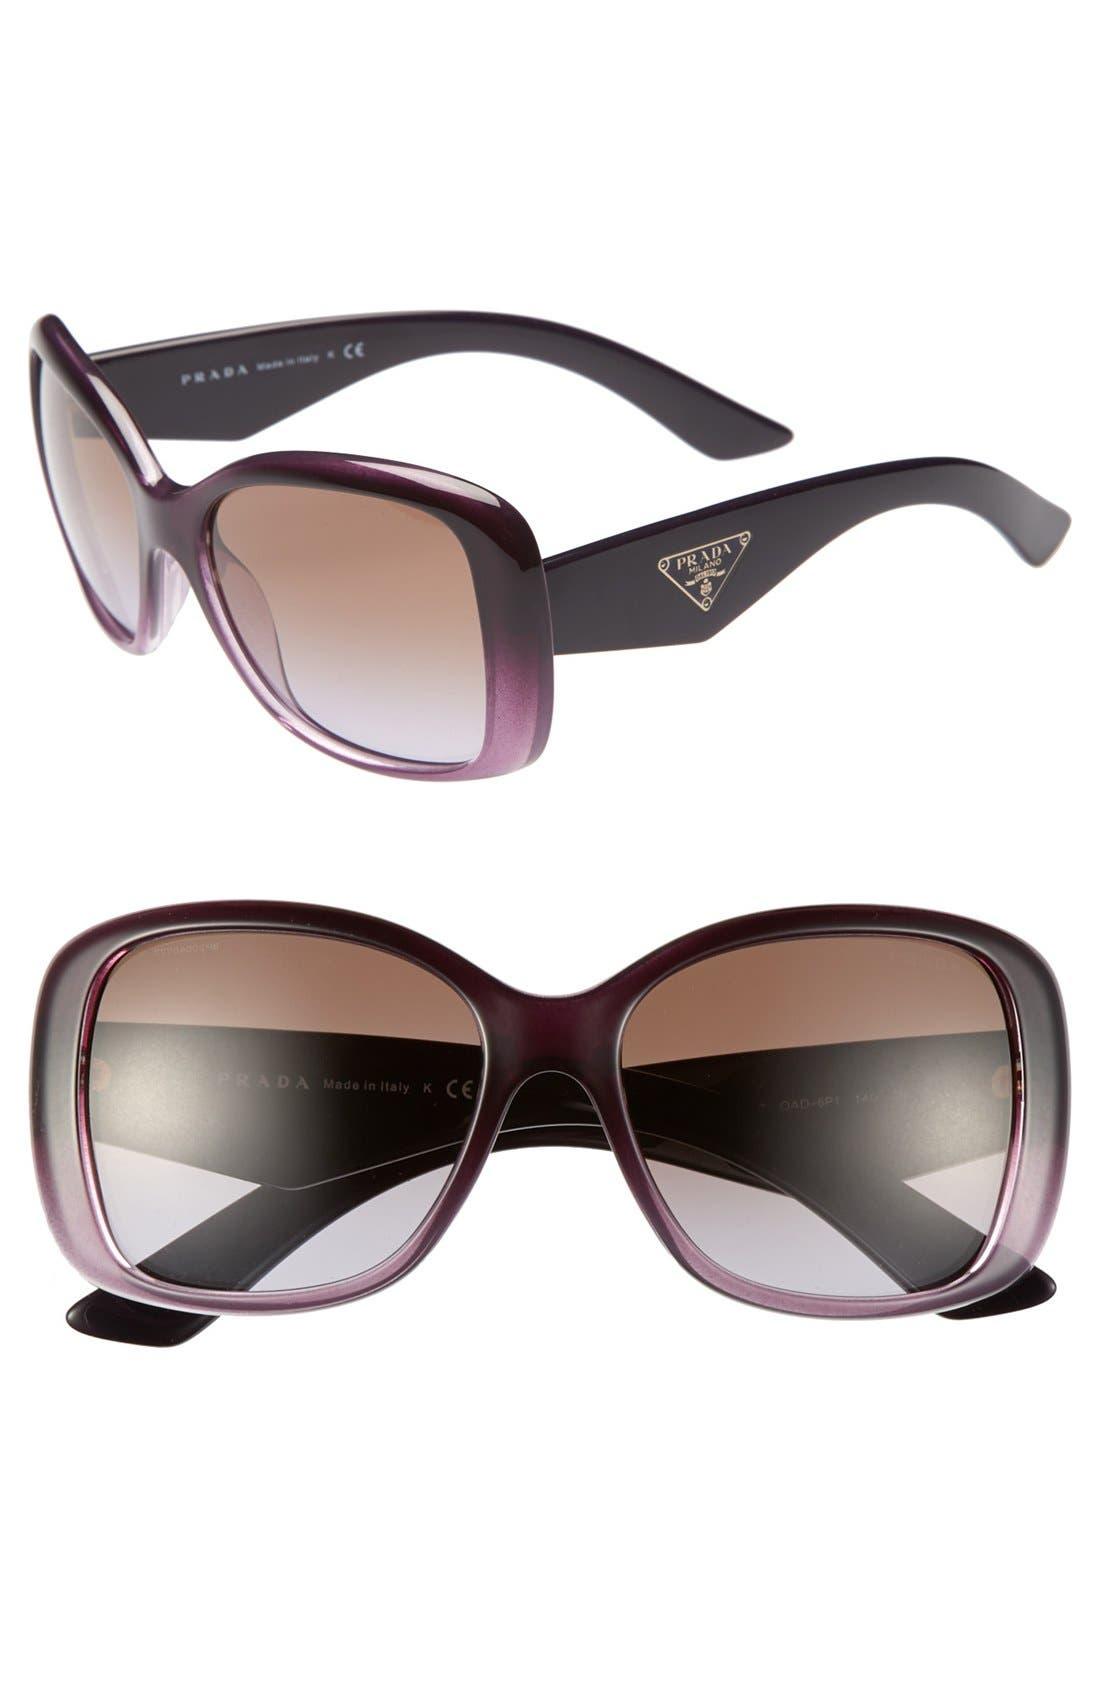 Main Image - Prada 57mm Oversized Sunglasses